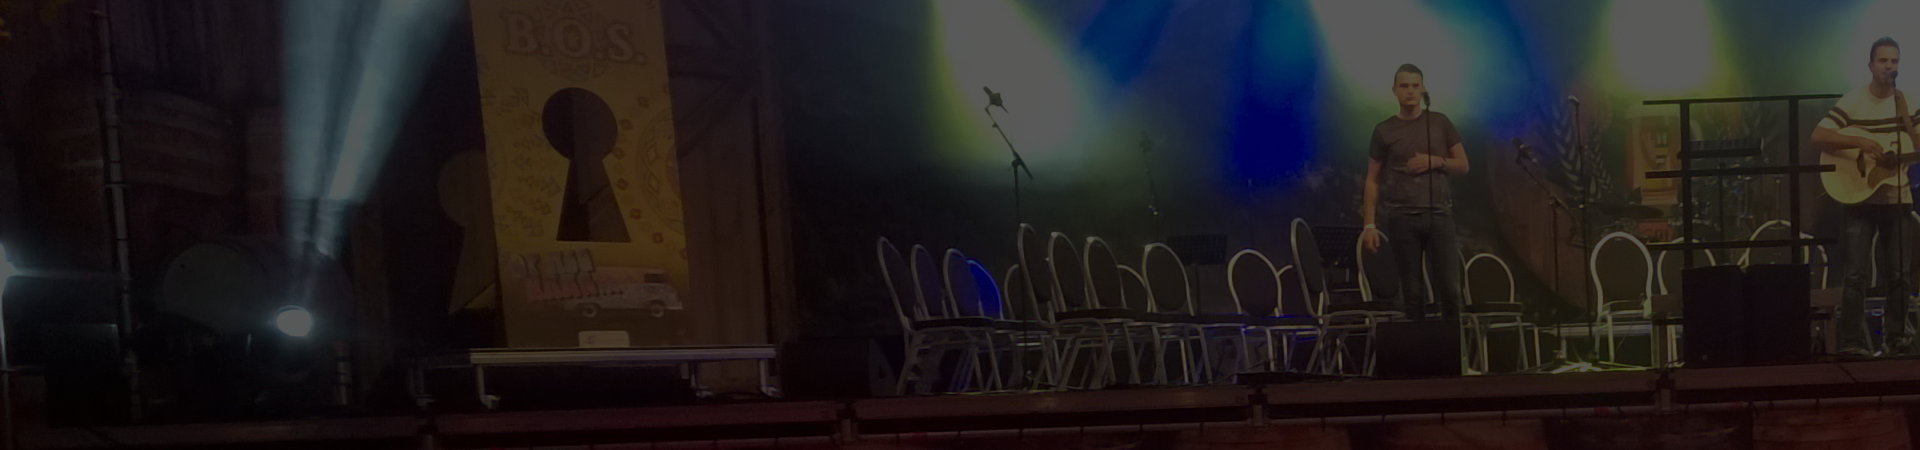 Stichtingsfeesten zorg organisatie de Riethorst Stromenland